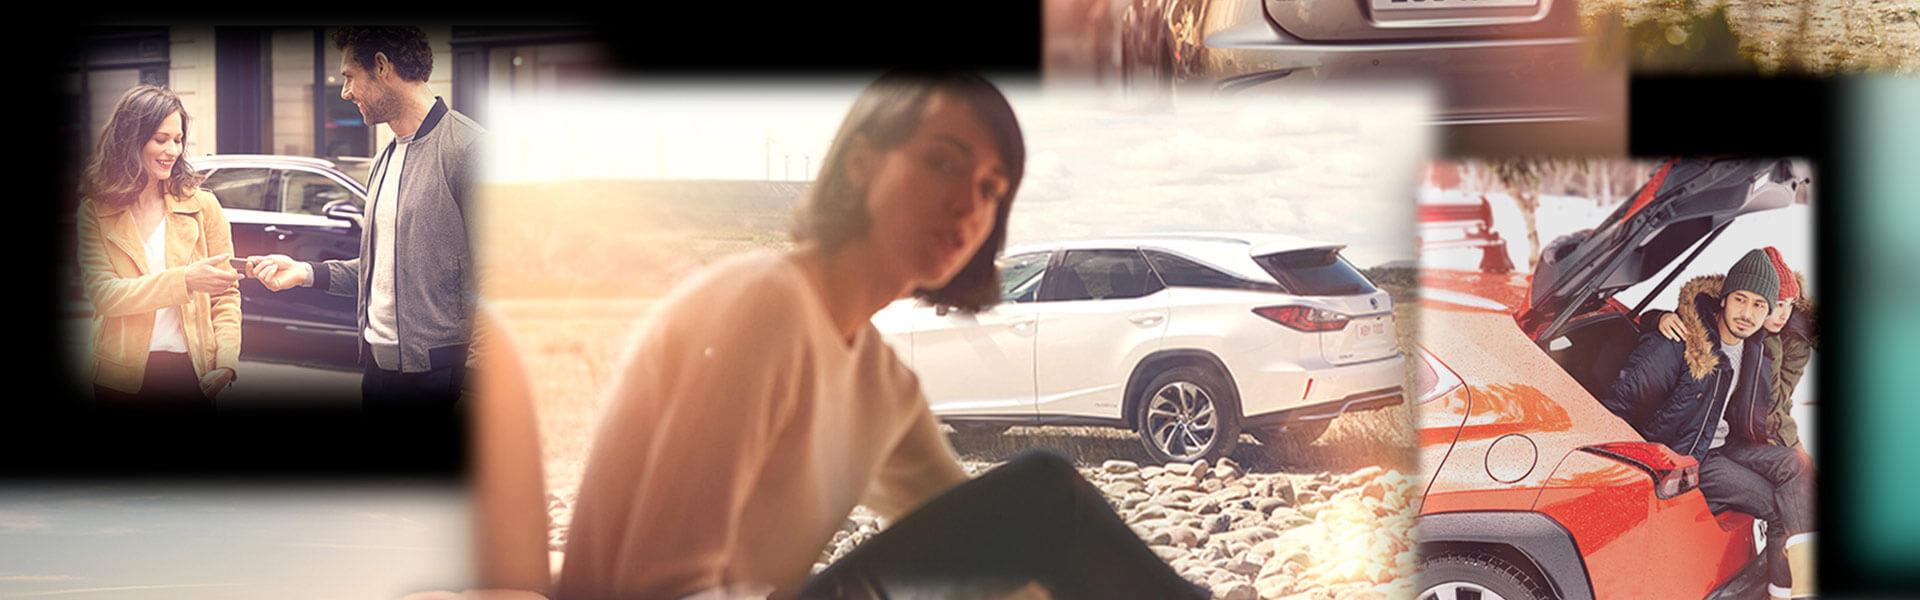 Lexus Relax Hero